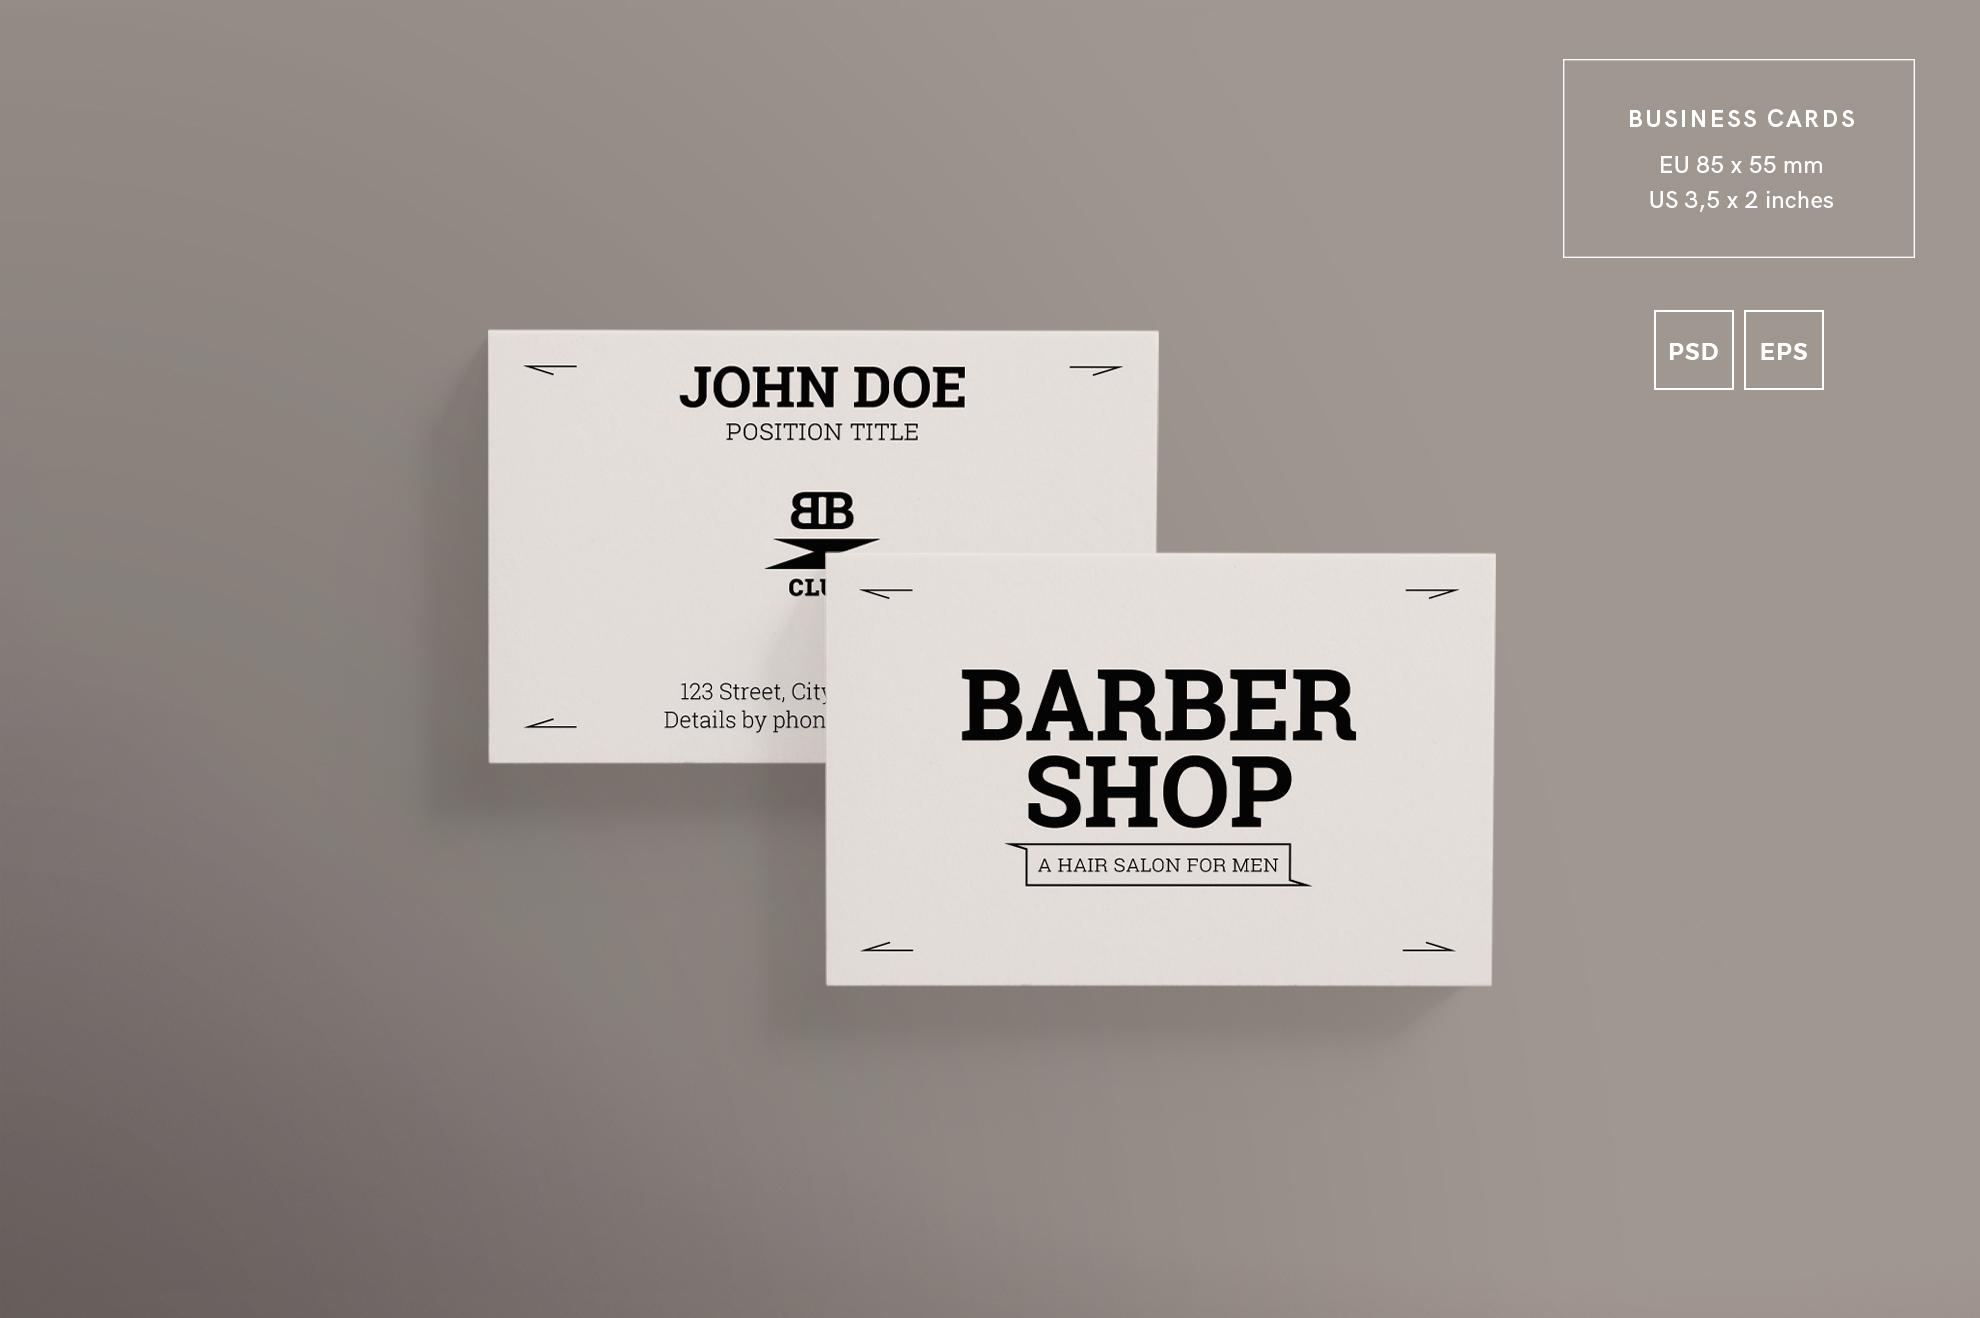 Barber shop design templates bundle by design bundles barber shop design templates bundle example image 2 colourmoves